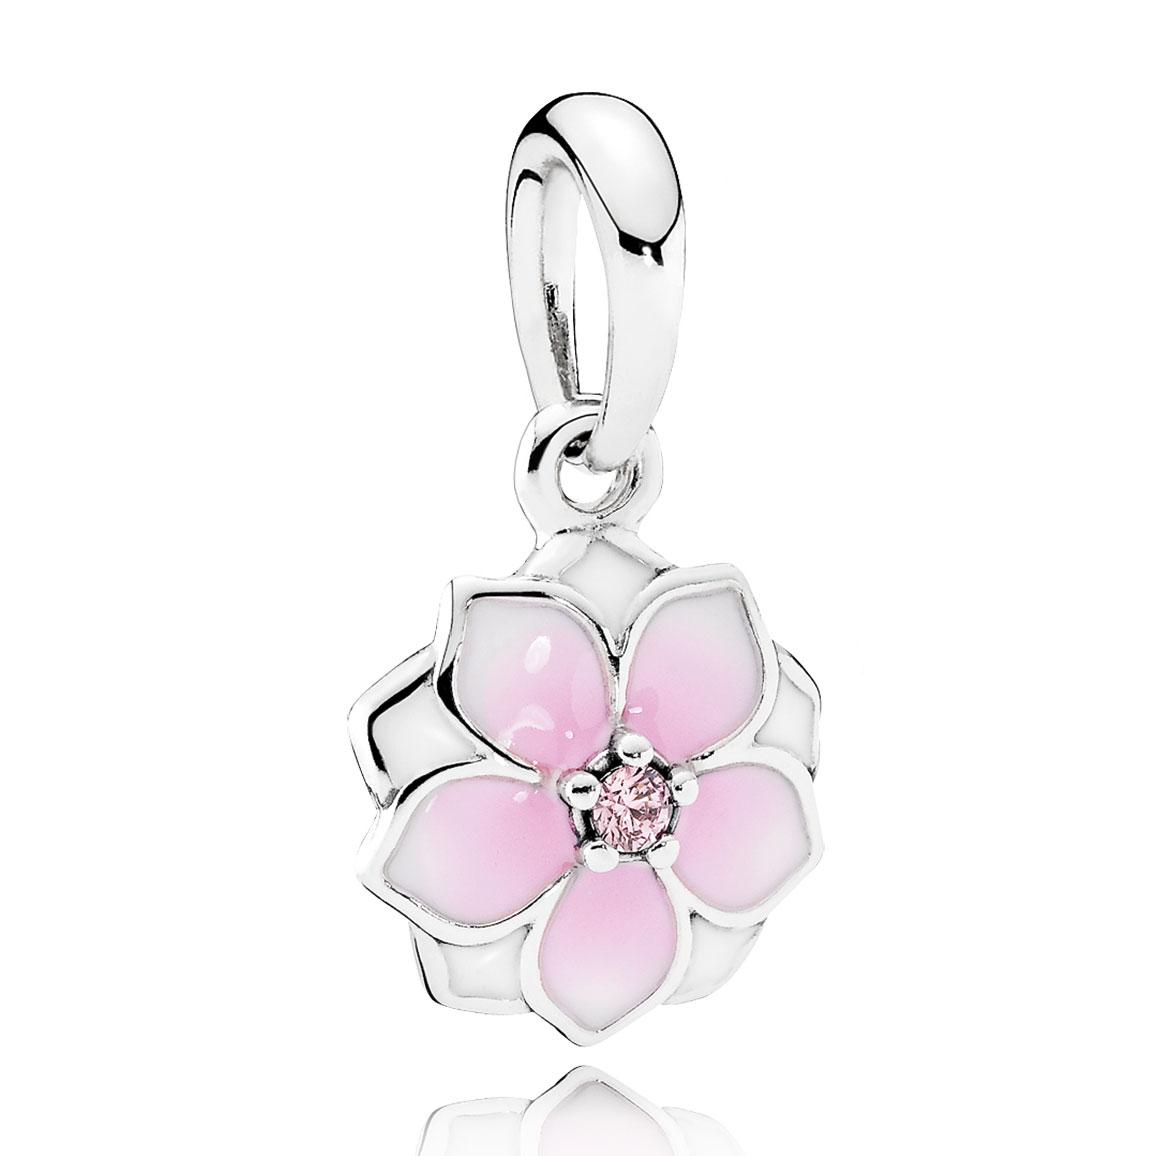 Pandora pendants pancharmbracelets pandora magnolia bloom pale cerise enamel amp pink cz pendant aloadofball Choice Image